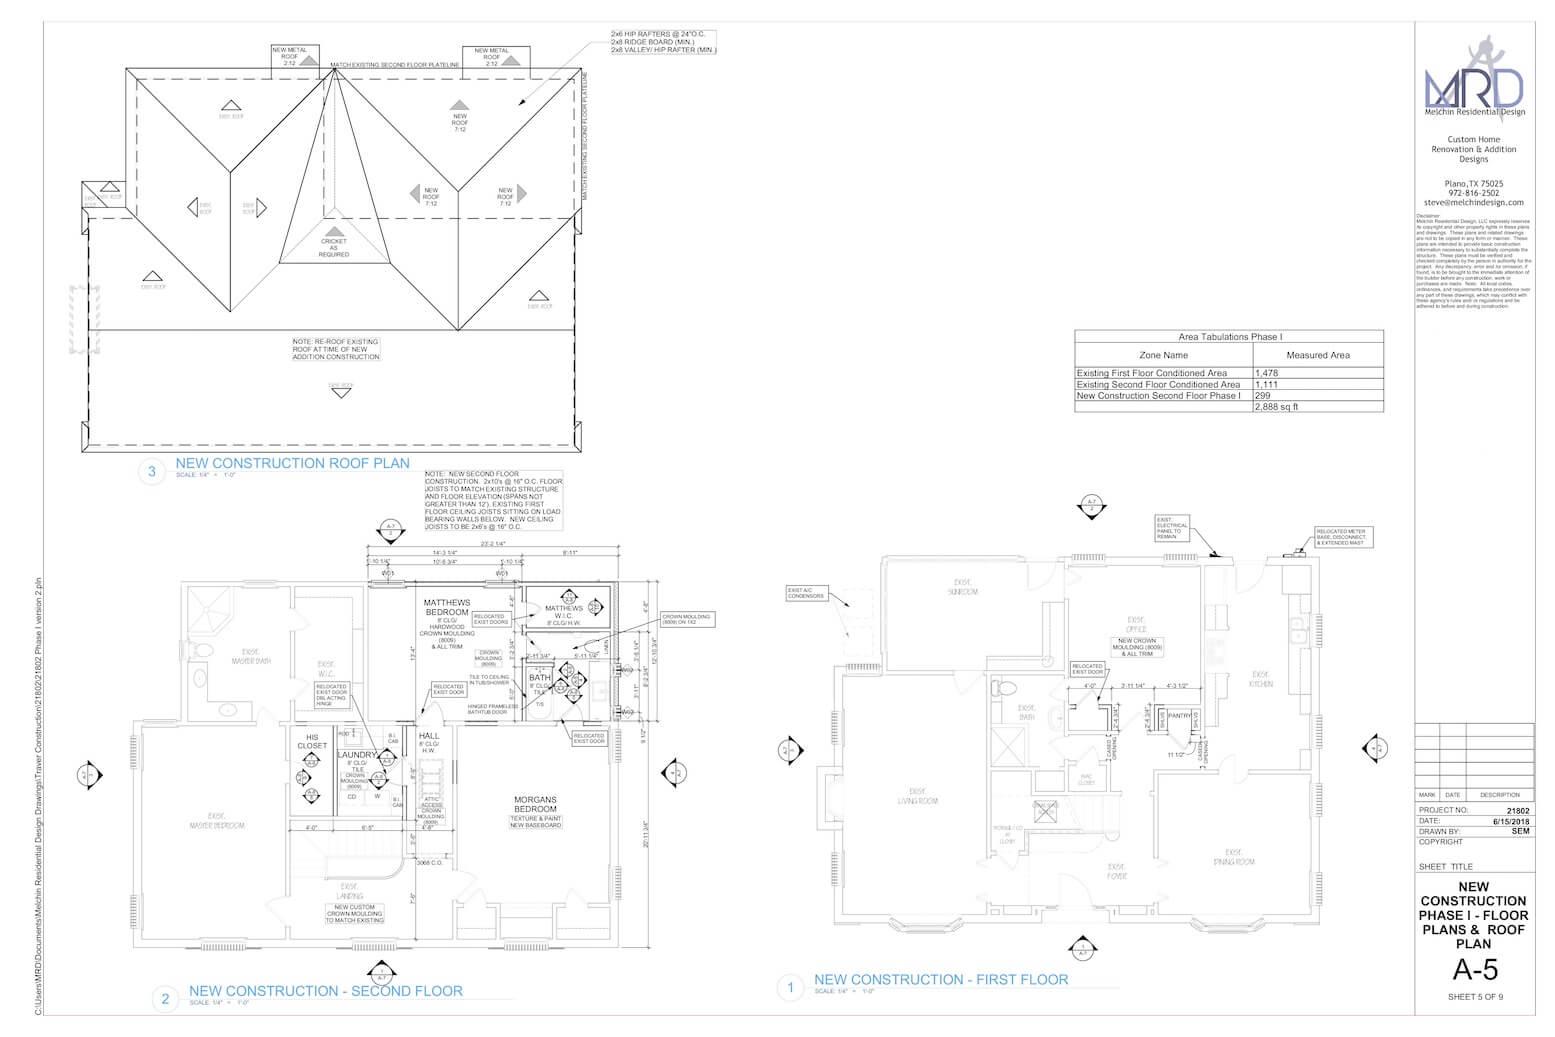 4571-Rheim-Phase-I-005